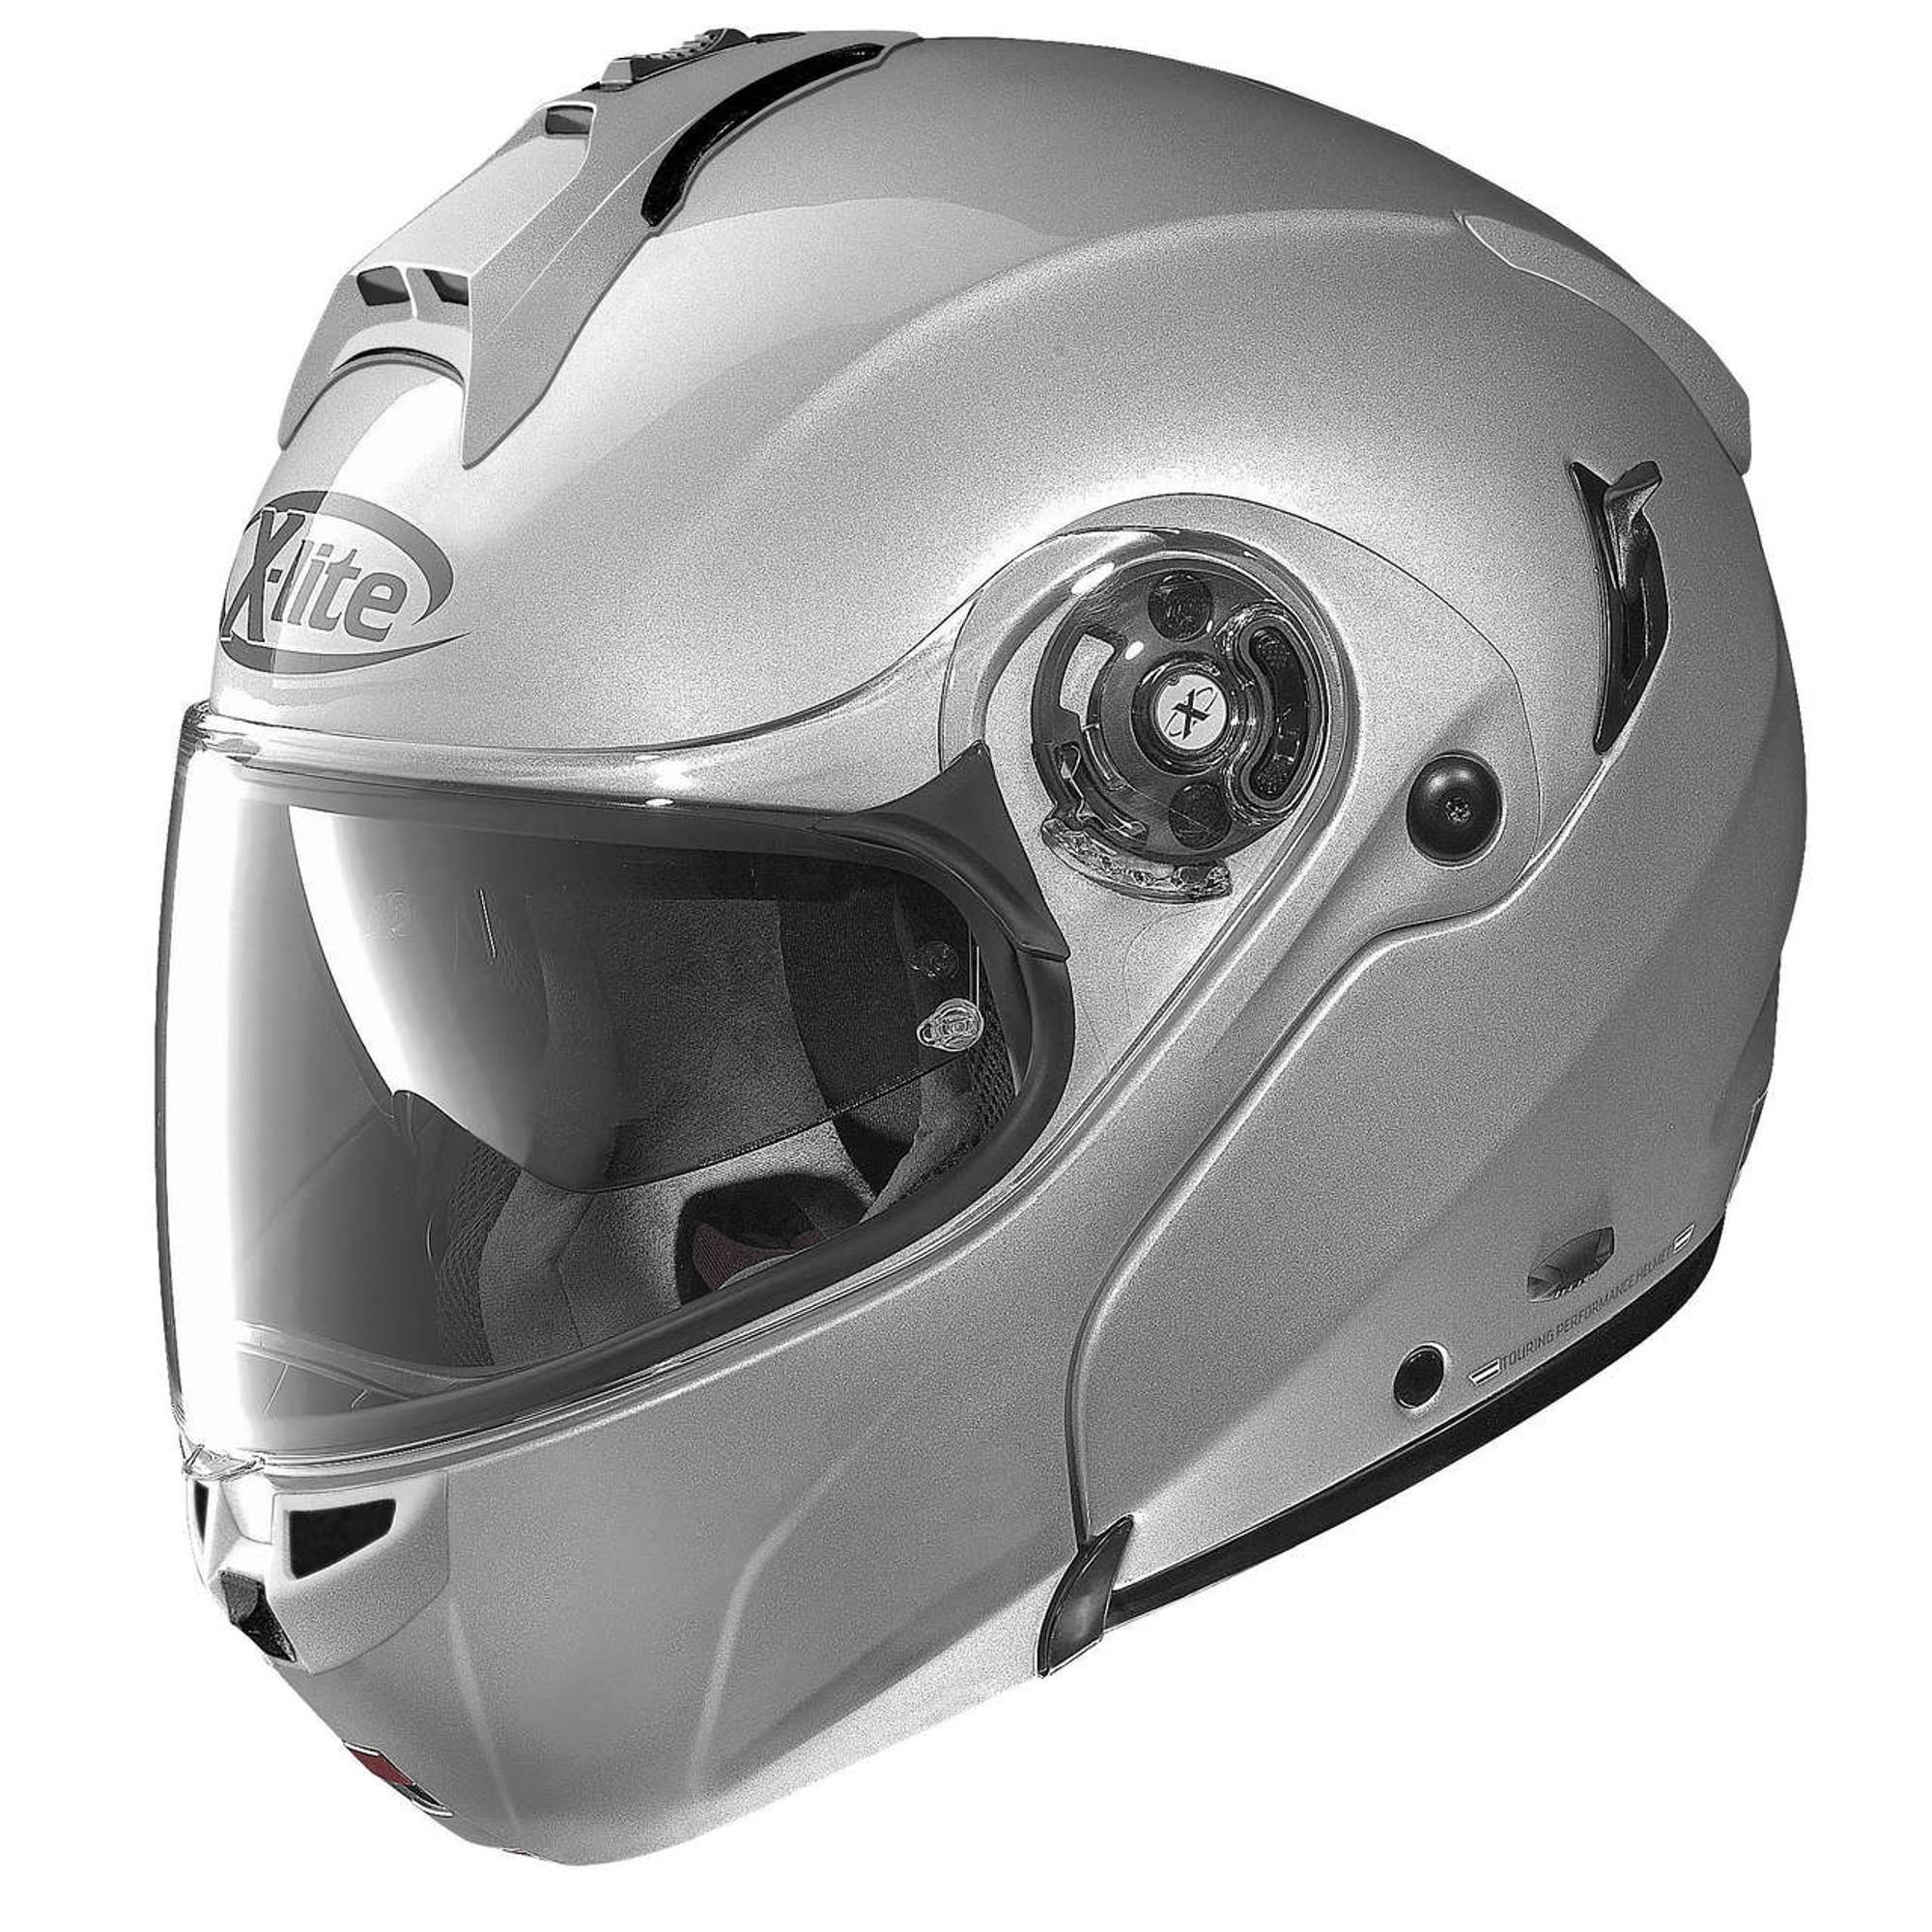 nolan x lite x 1004 xcom helmet get lowered cycles. Black Bedroom Furniture Sets. Home Design Ideas